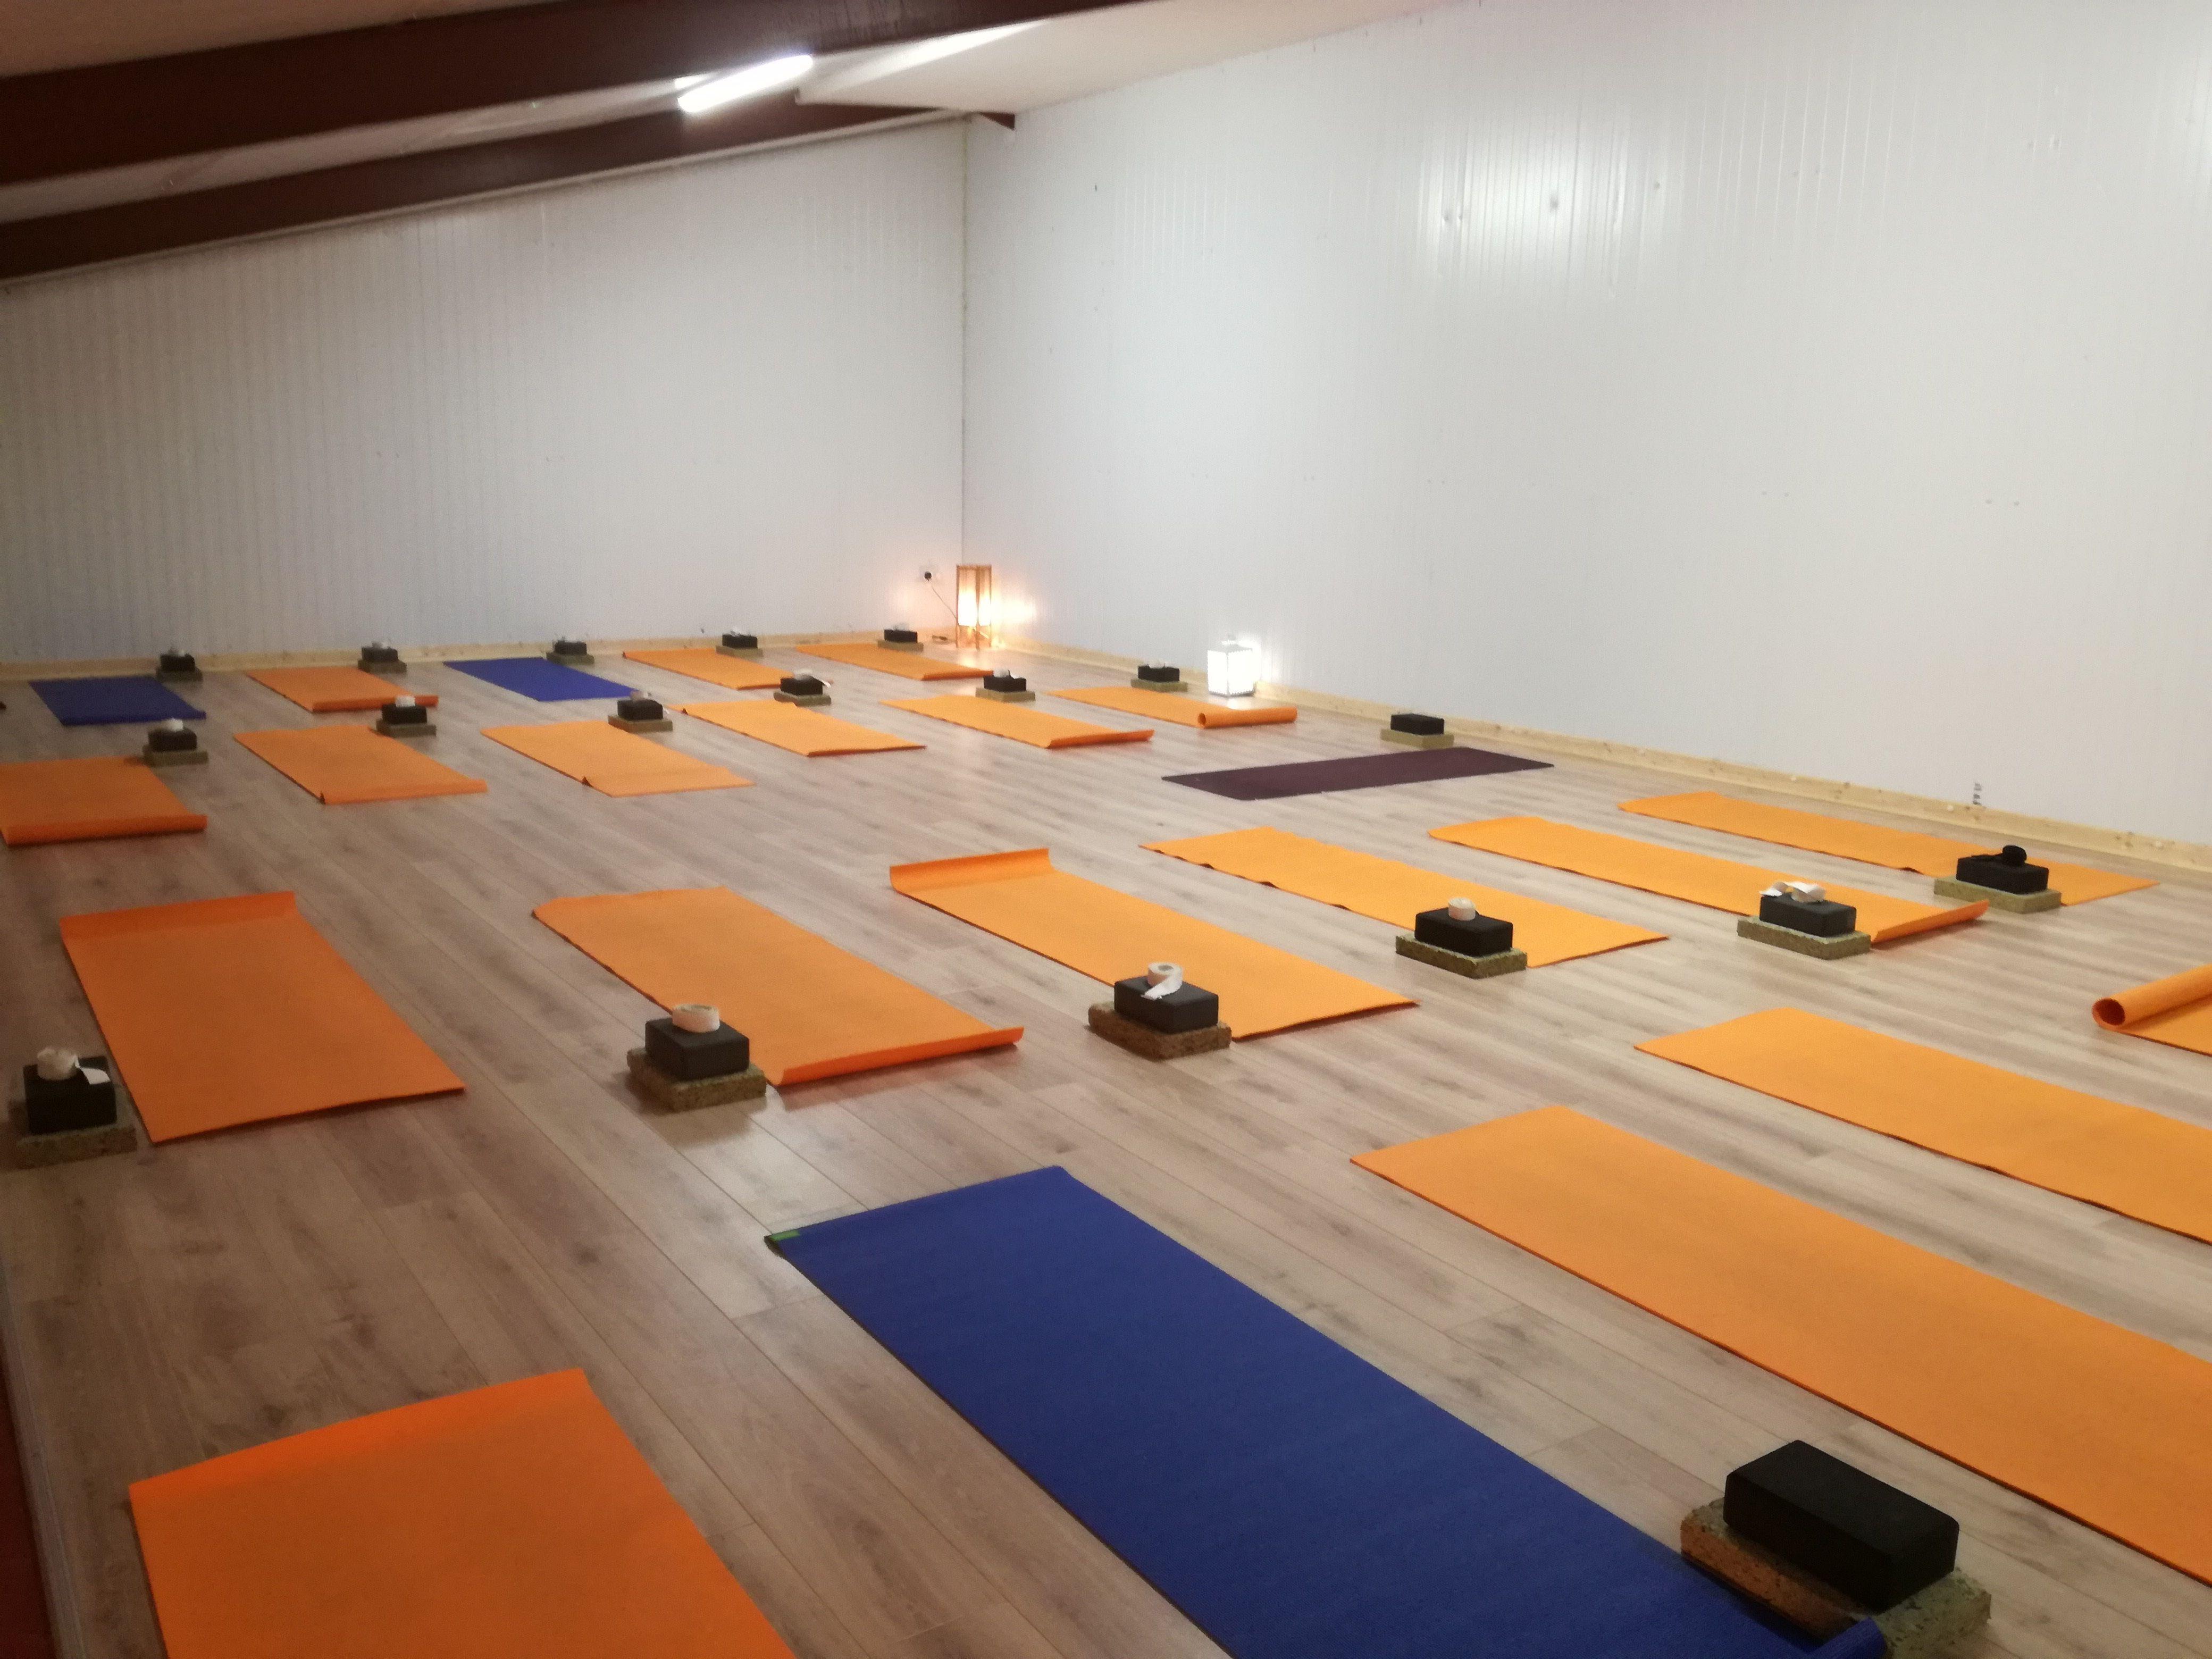 Cork Lotus Yoga, City Centre - Classes for all levels